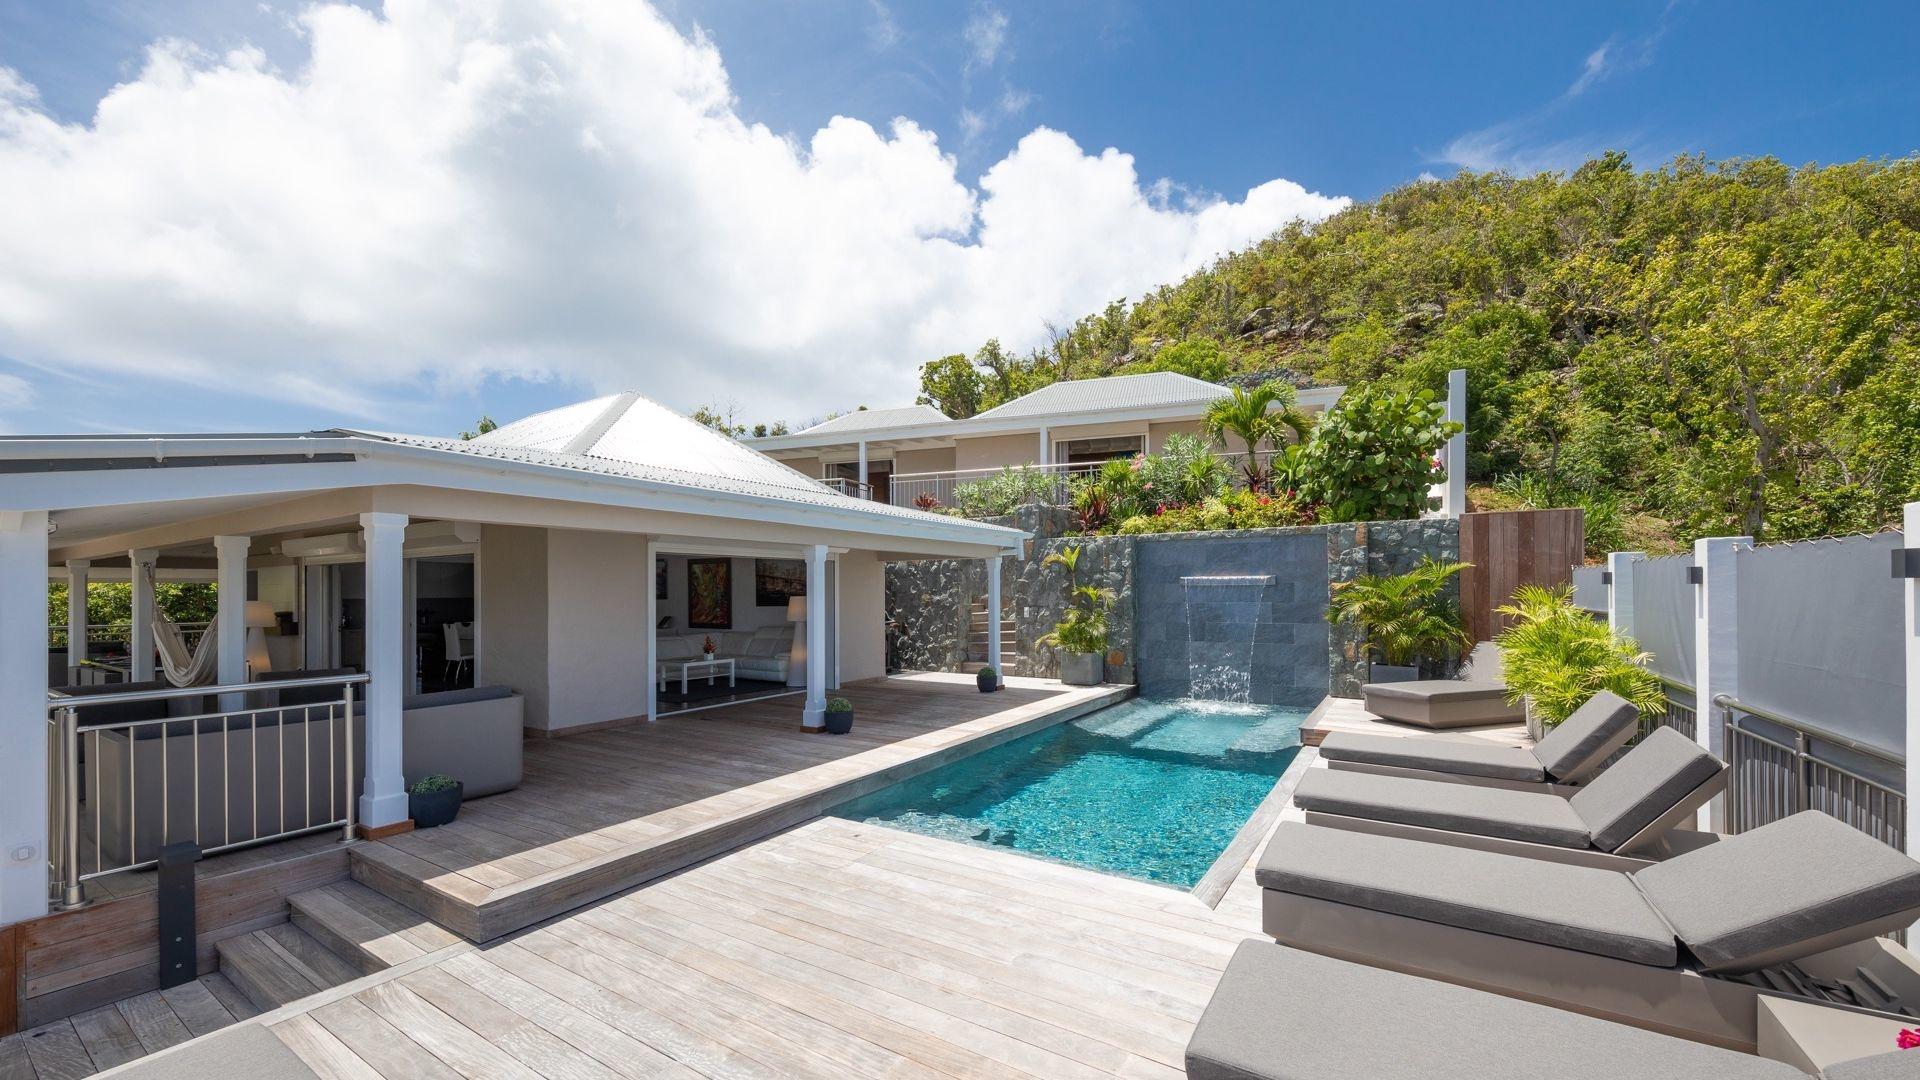 Luxury villa rentals caribbean - St barthelemy - Flamands - No location 4 - Lenalee - Image 1/26